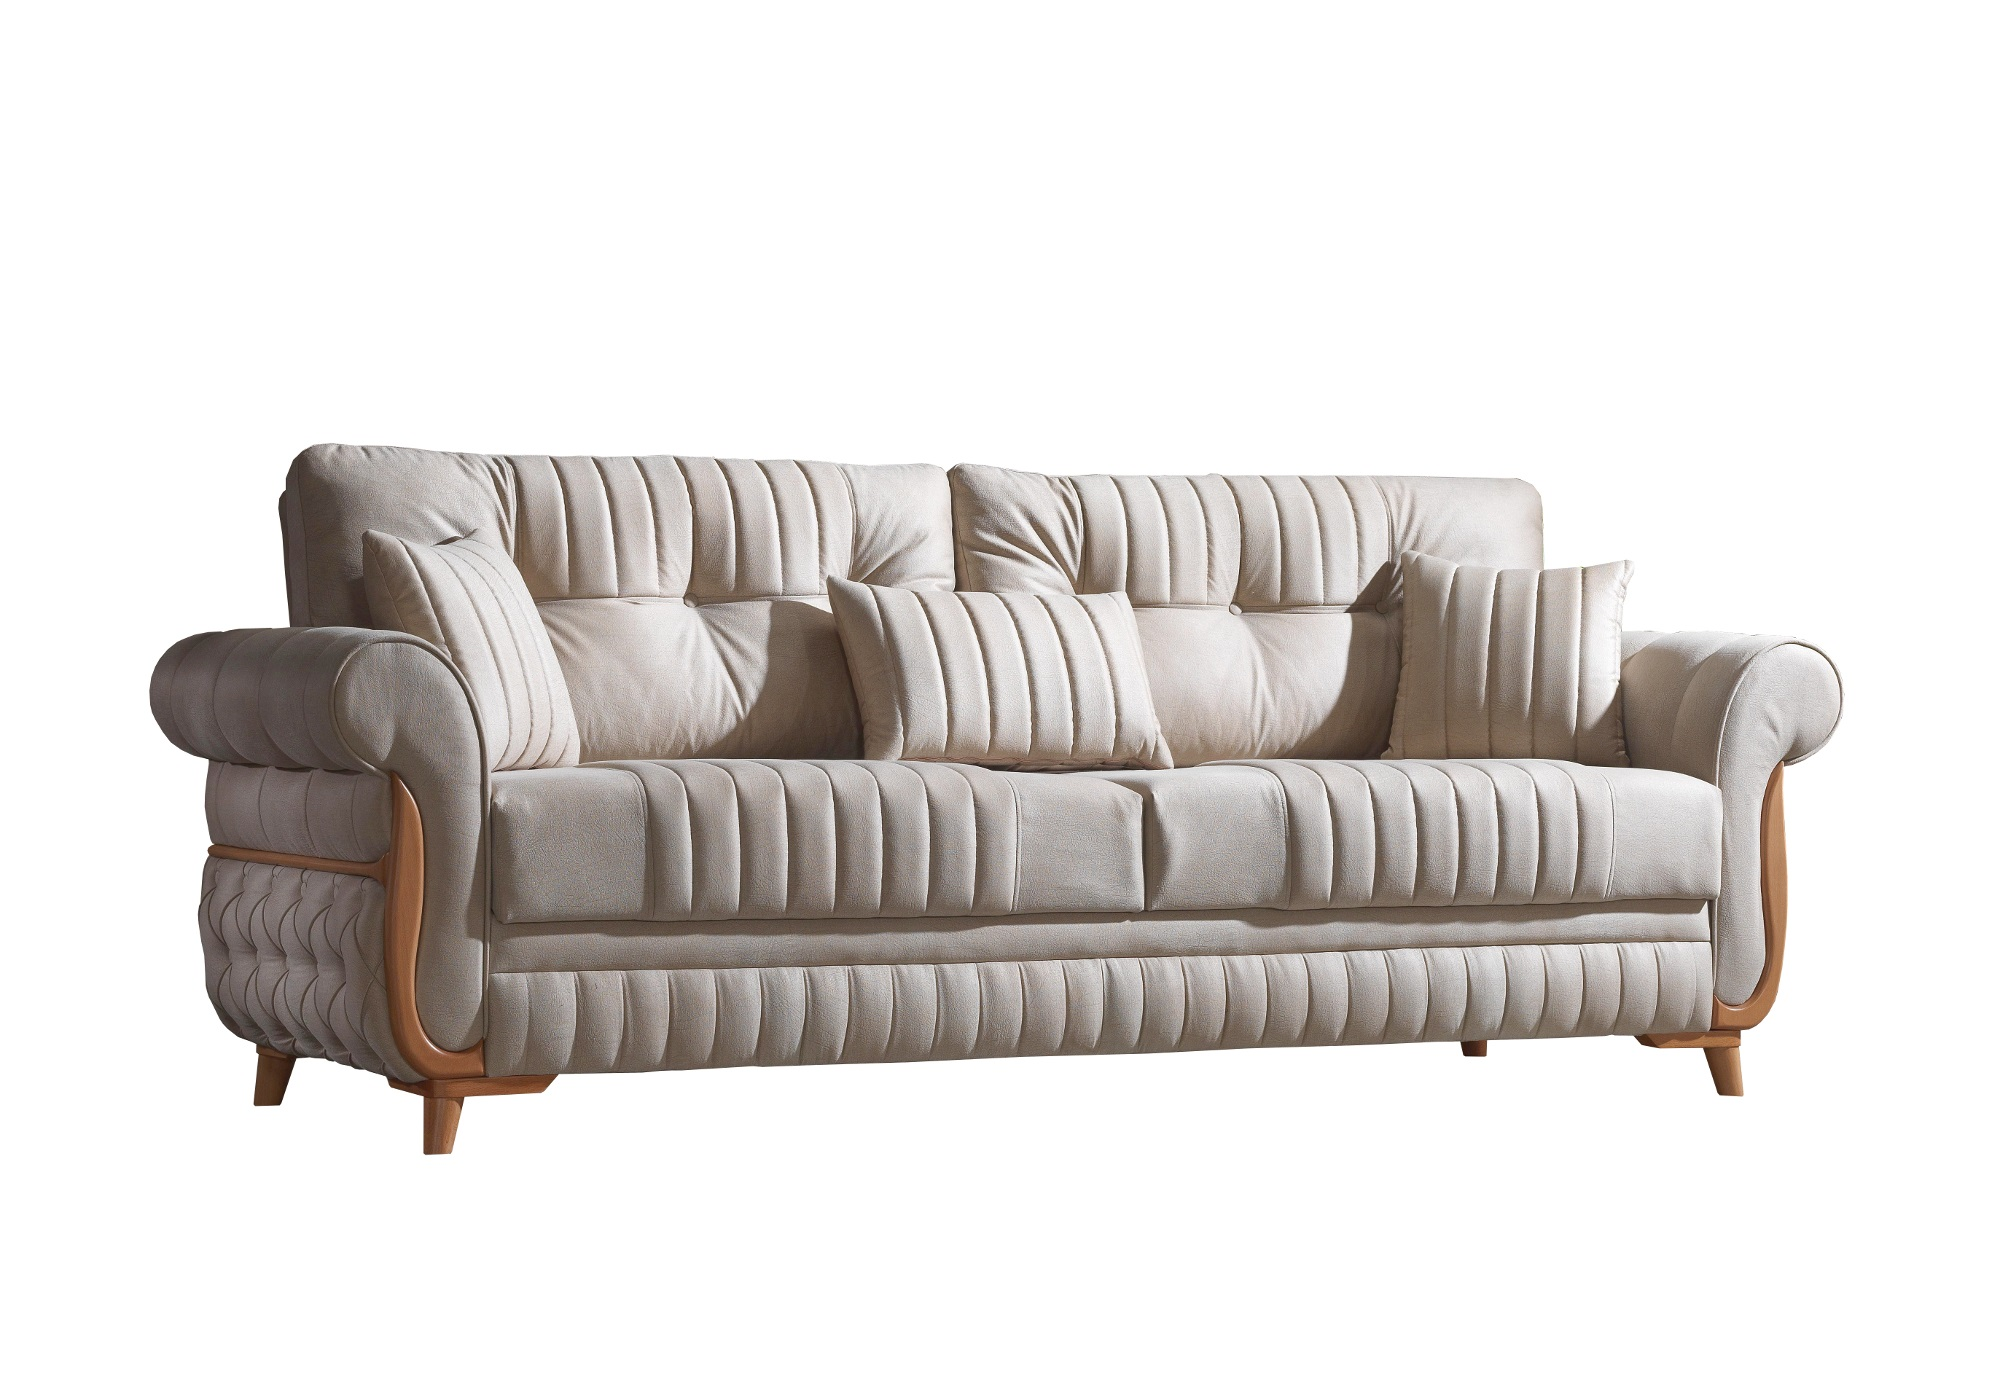 Canapé lit tissu daim beige MIRANDA